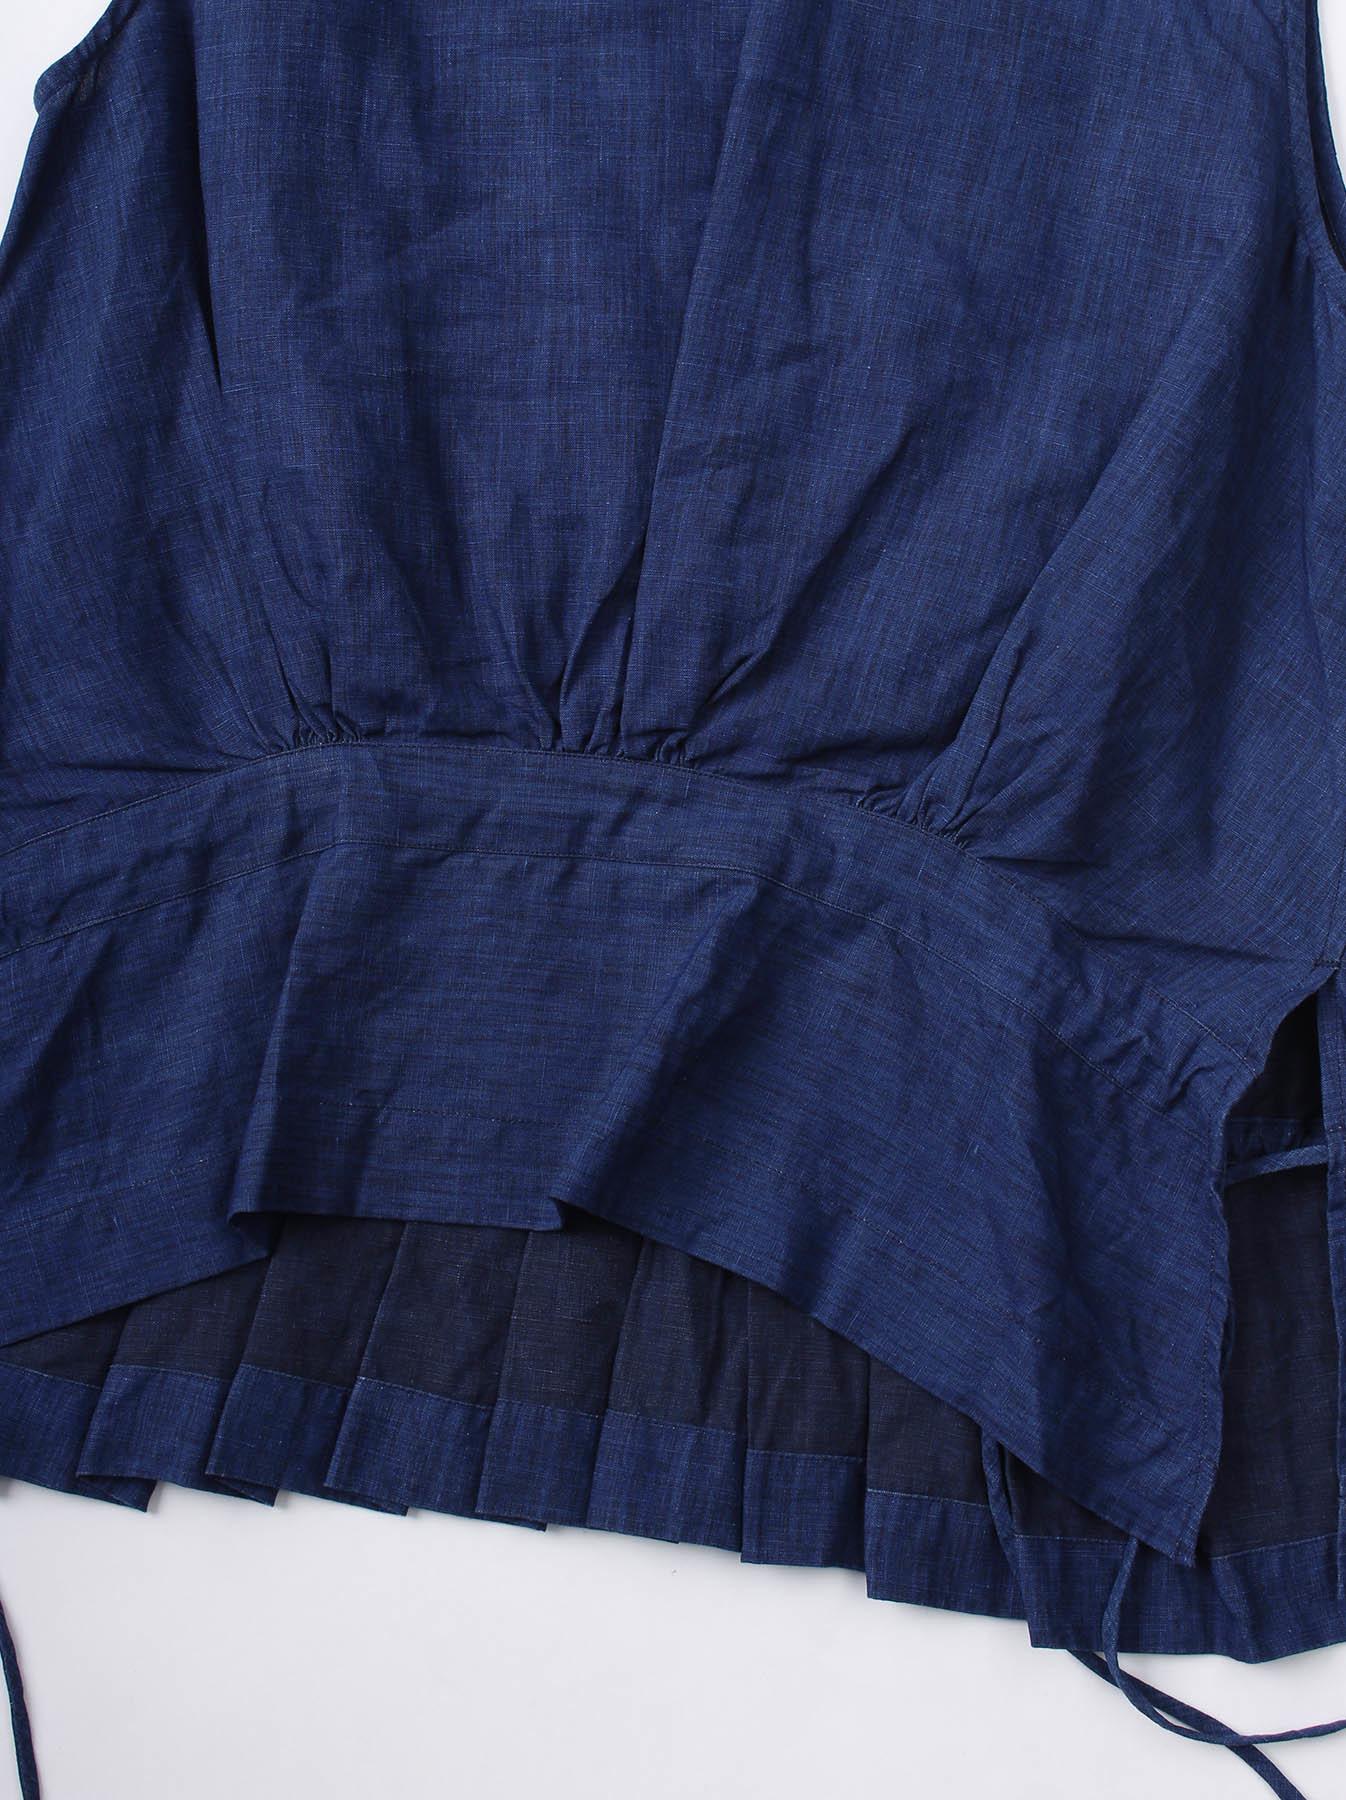 WH Indigo Linen Sleeveless Tuck Blouse-8